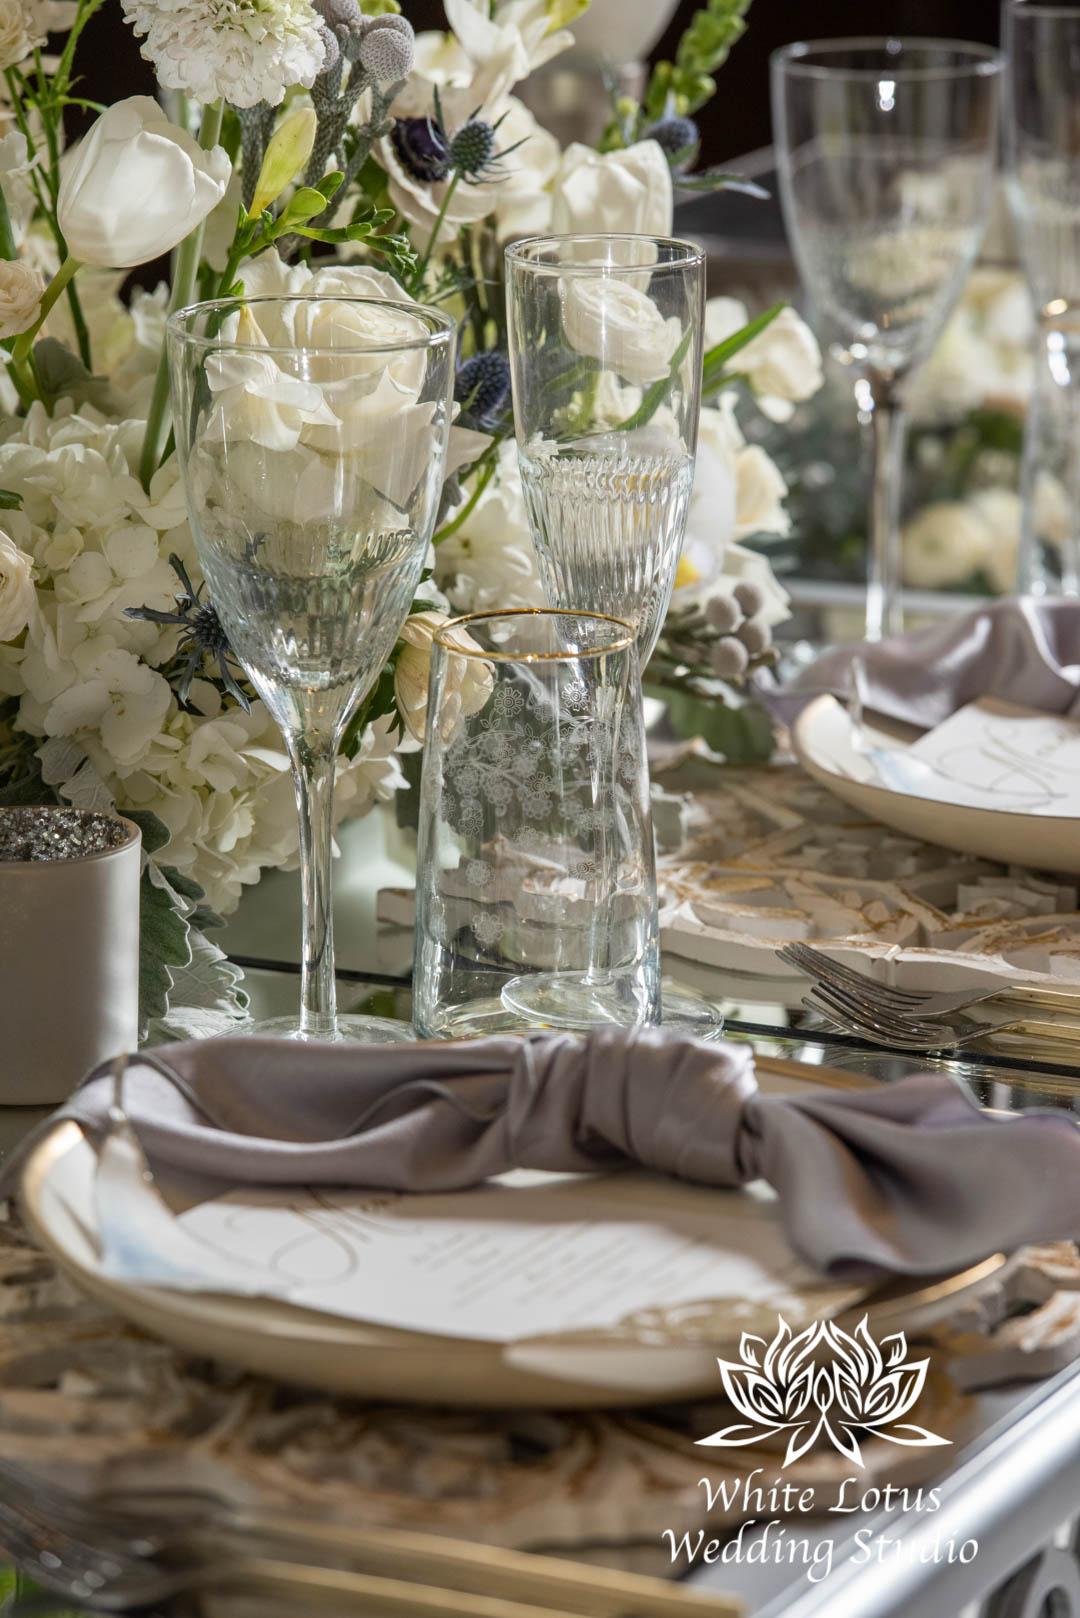 170- GLAM WINTERLUXE WEDDING INSPIRATION